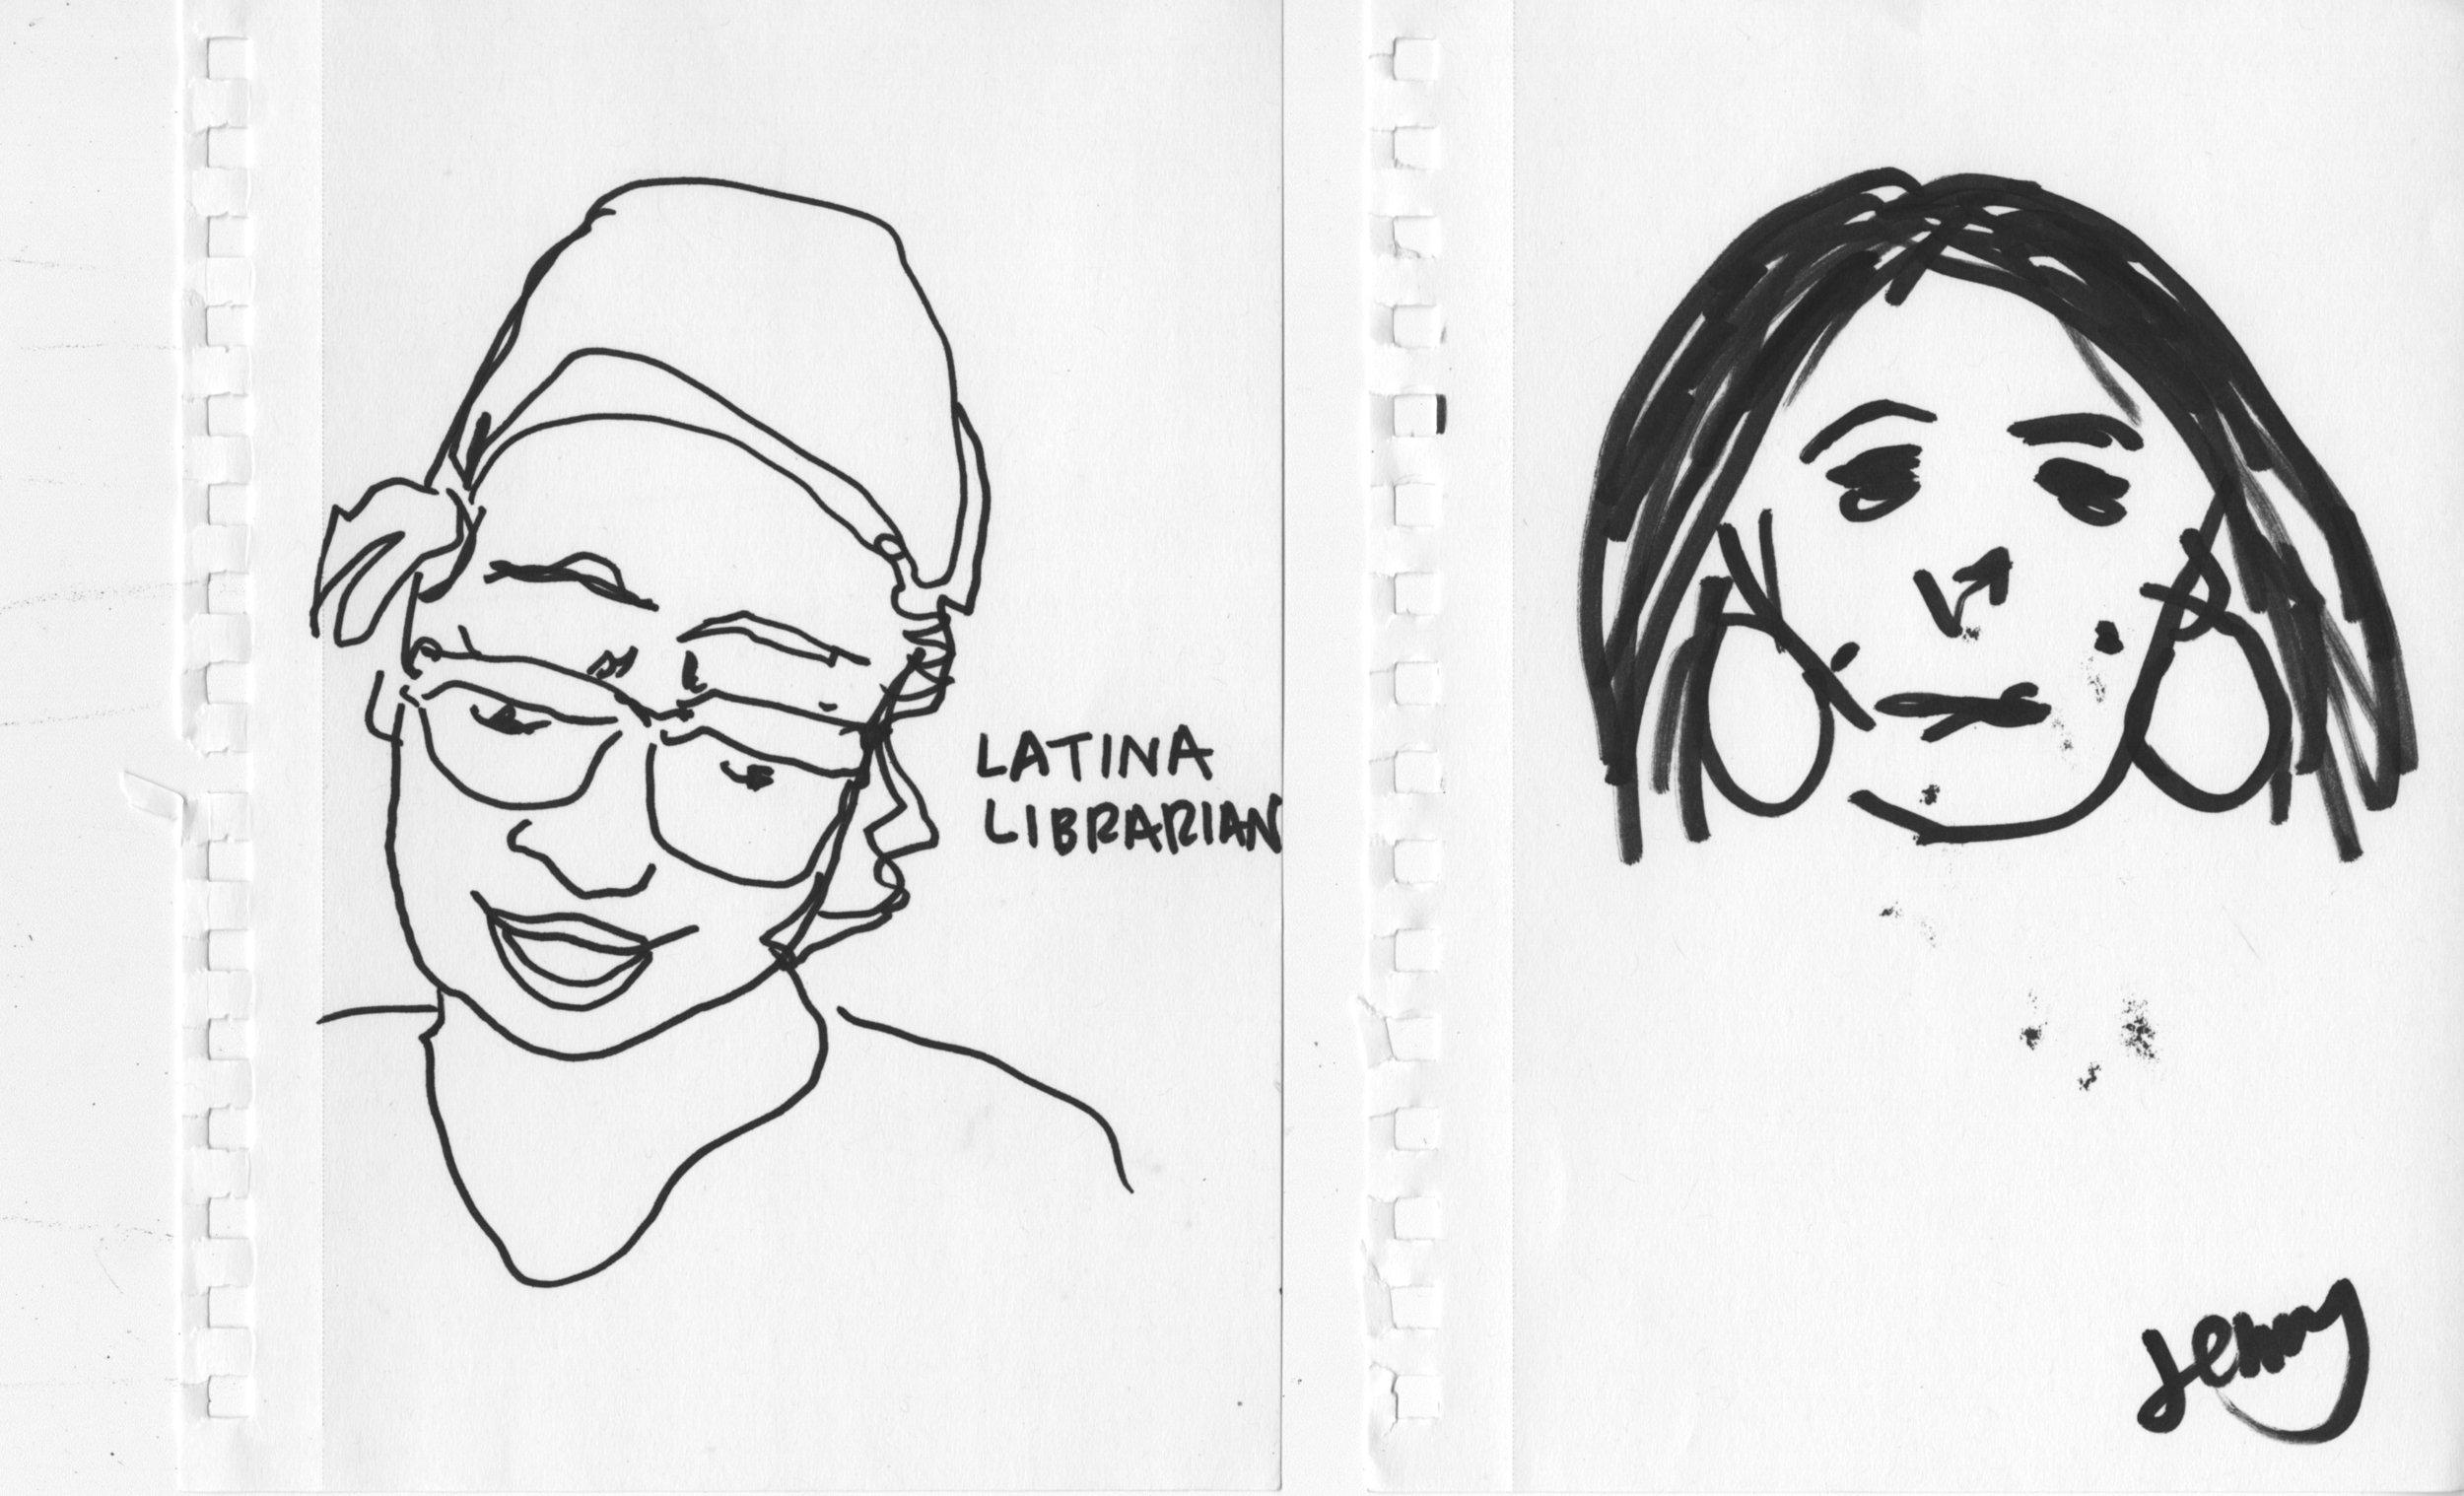 30_Jenny_Latina Librarian.jpg